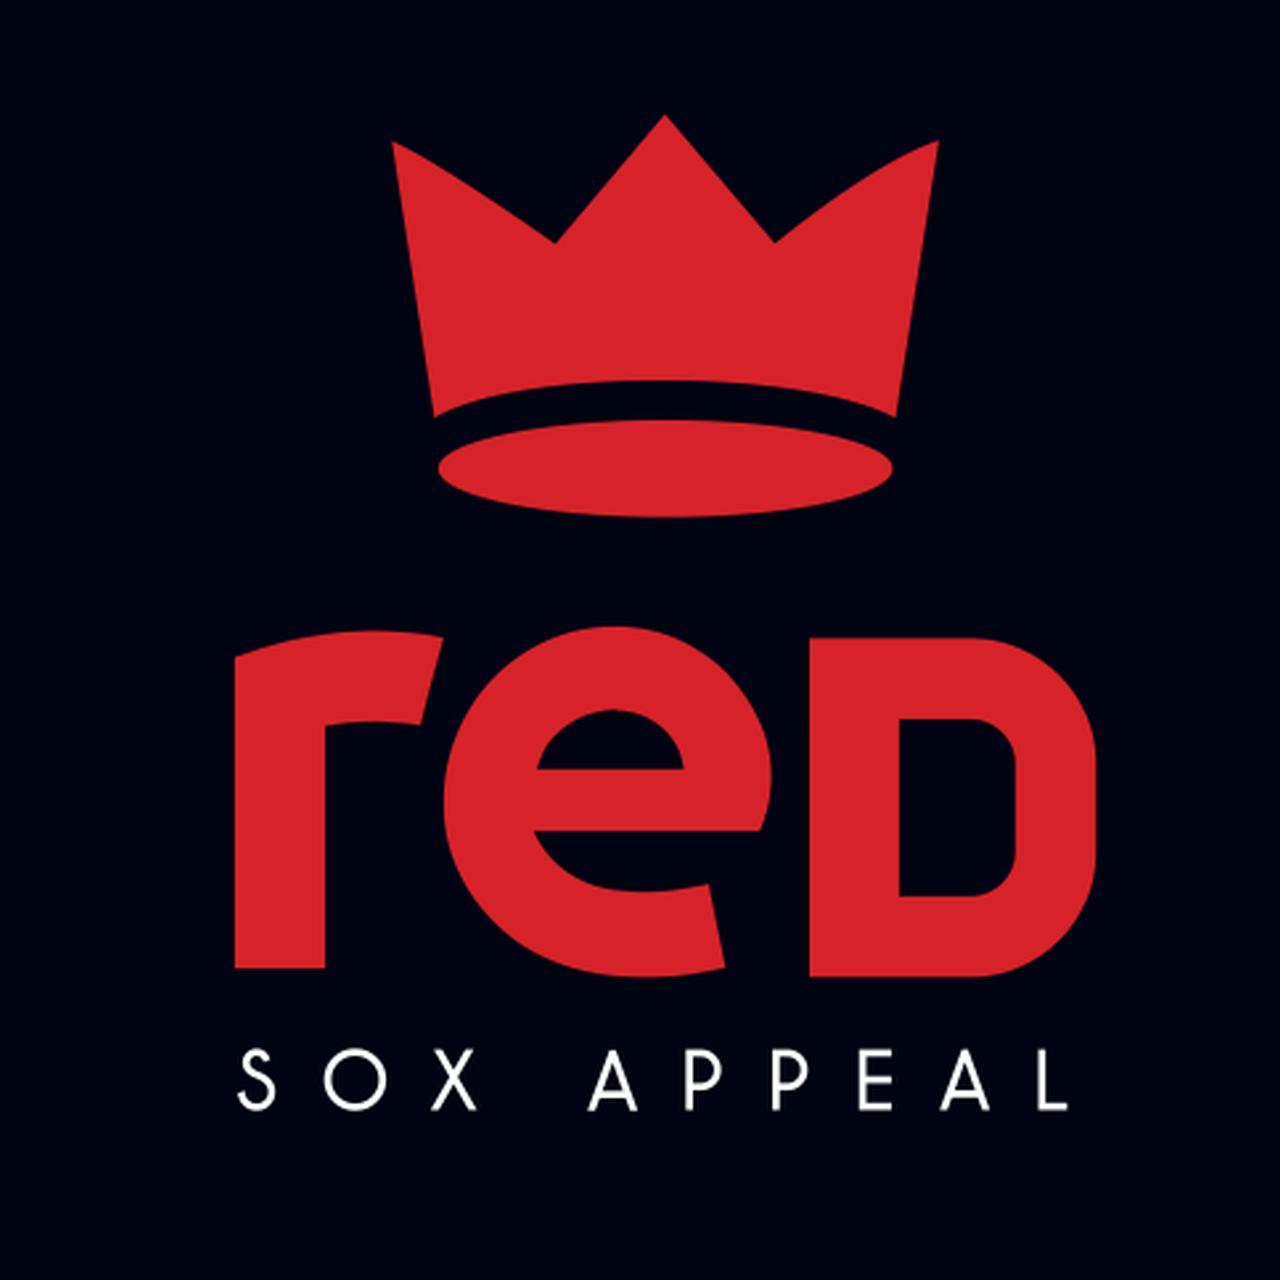 Red Sox Primavera Estate 2018